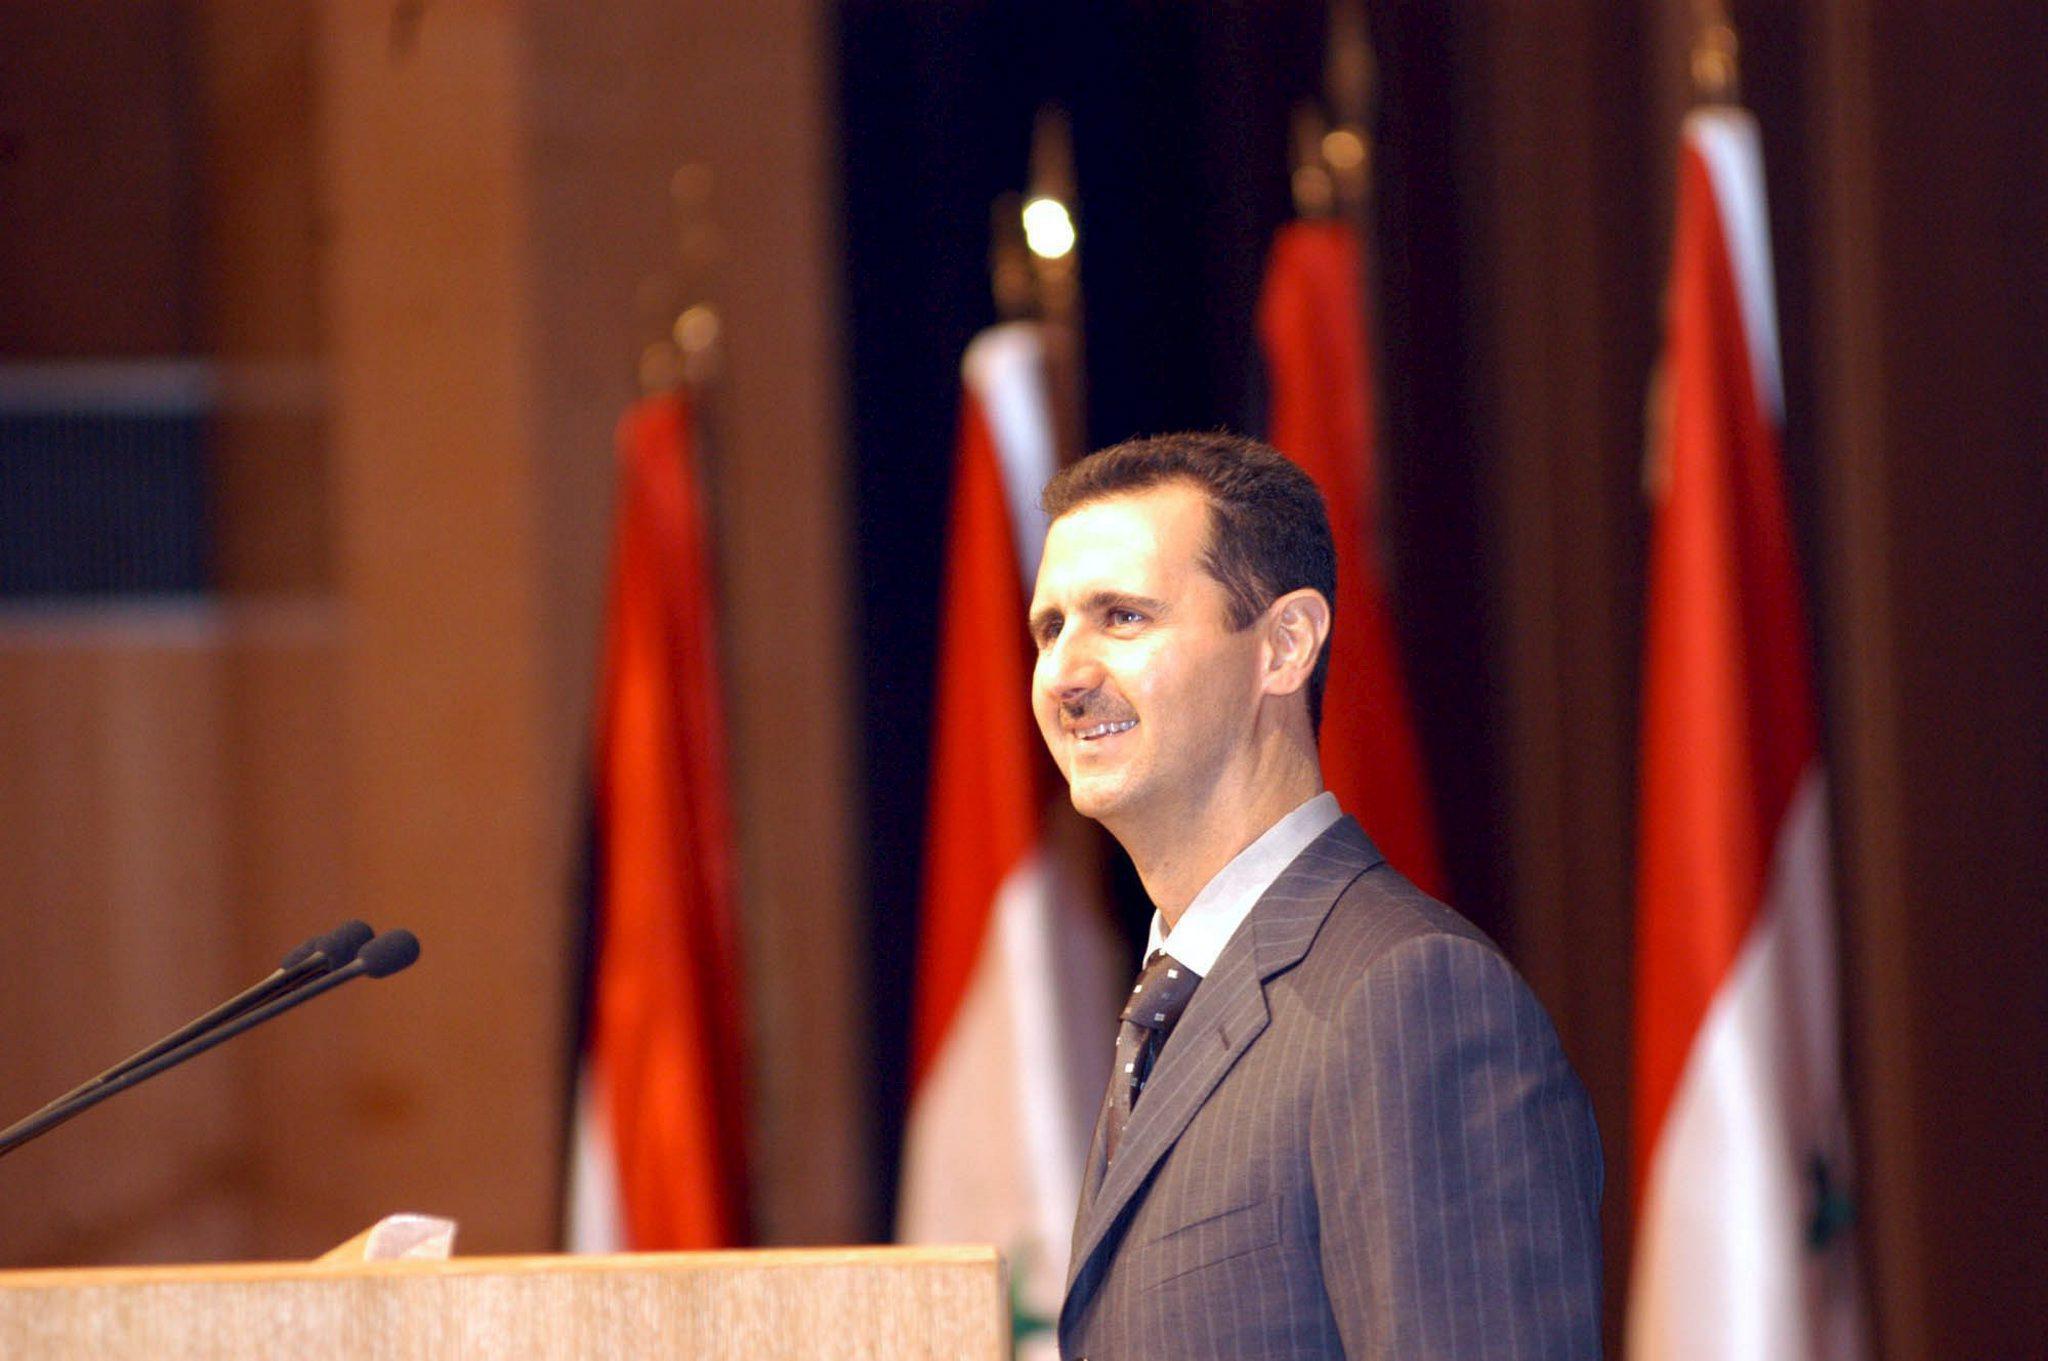 Al Asad niega que se den los factores para que reunión de Ginebra tenga éxito